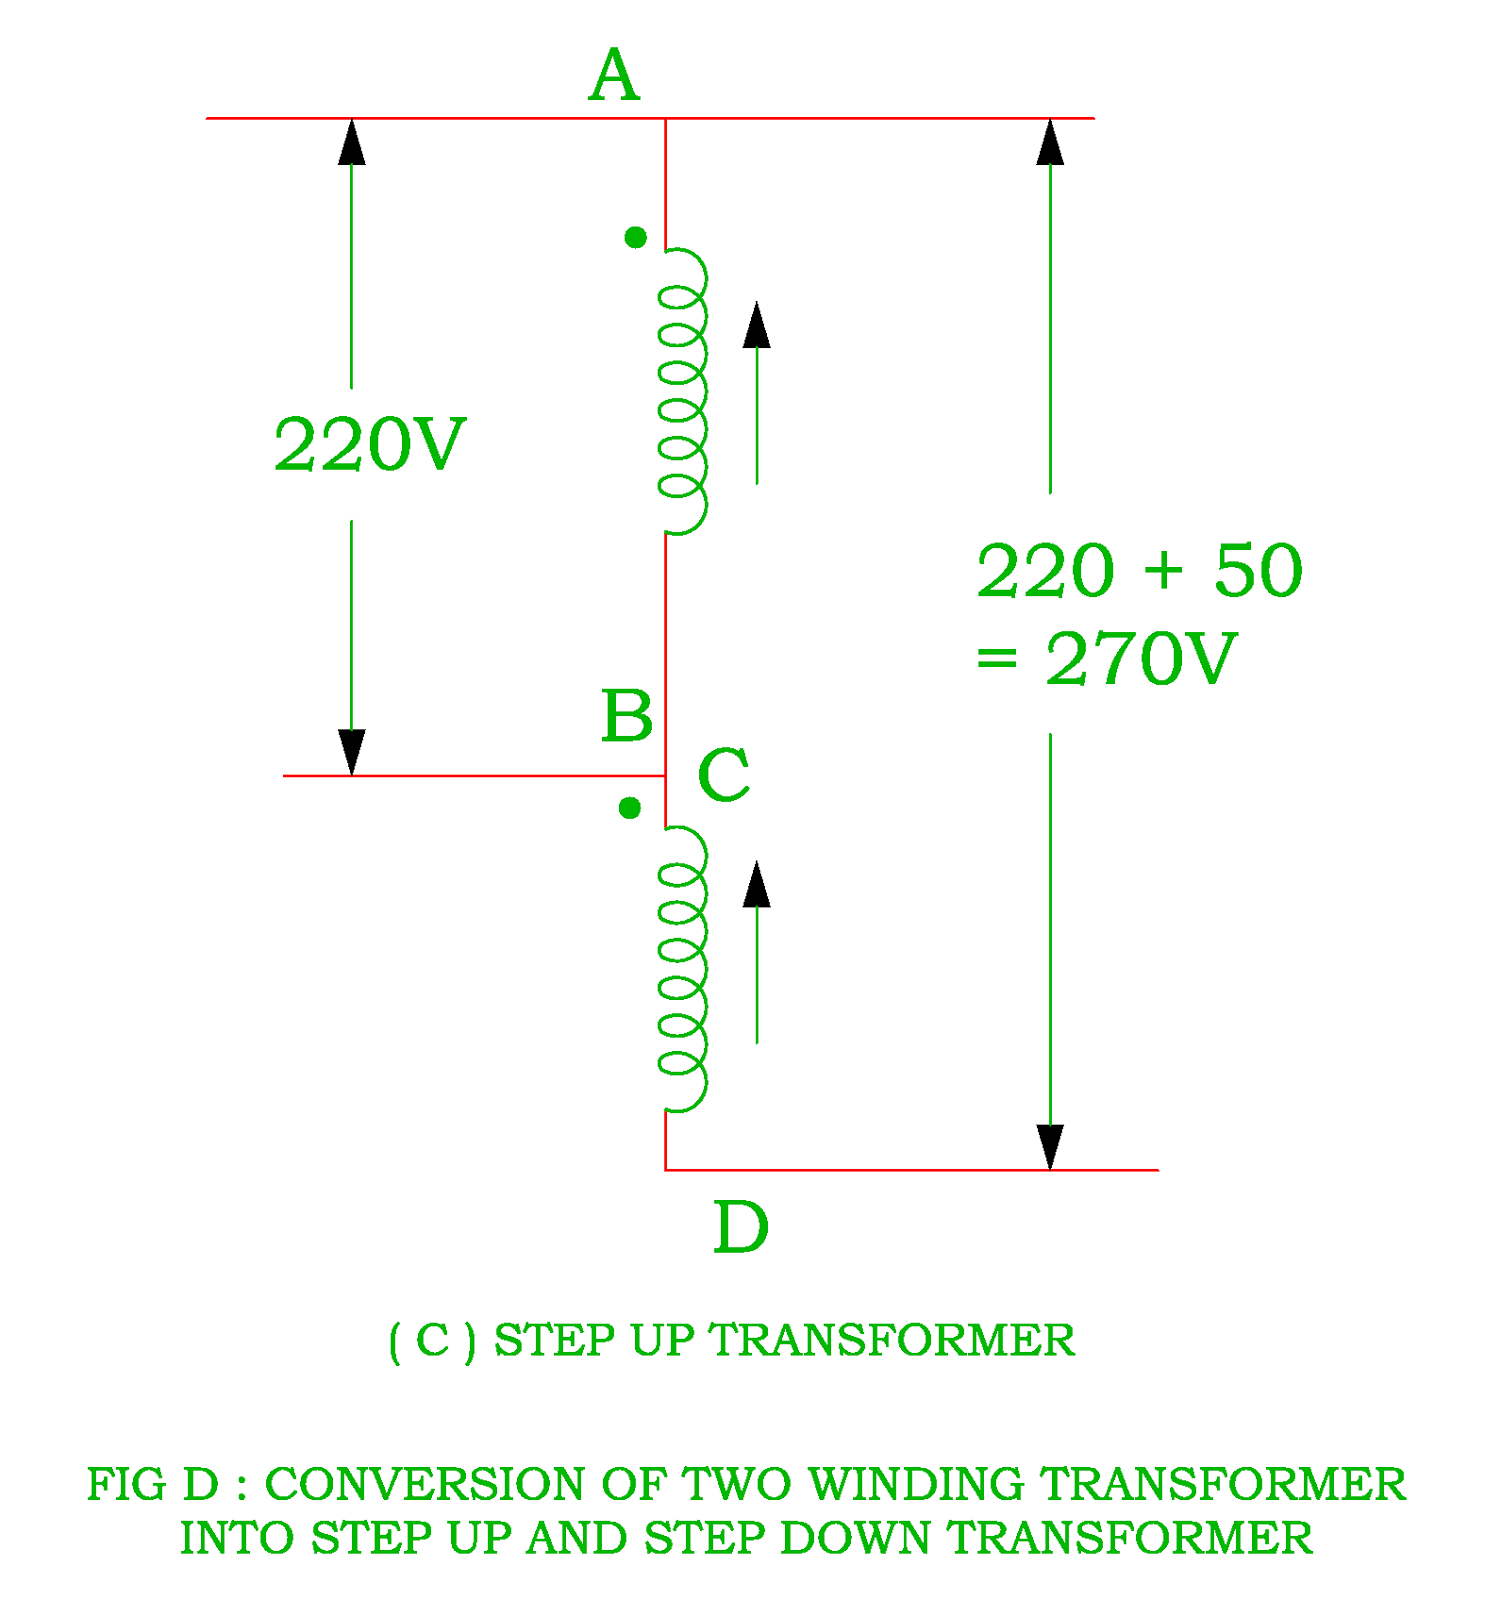 Amazing autotransformer wiring diagram pictures inspiration wiring diagram of auto transformer how often do i need to pump my cheapraybanclubmaster Choice Image